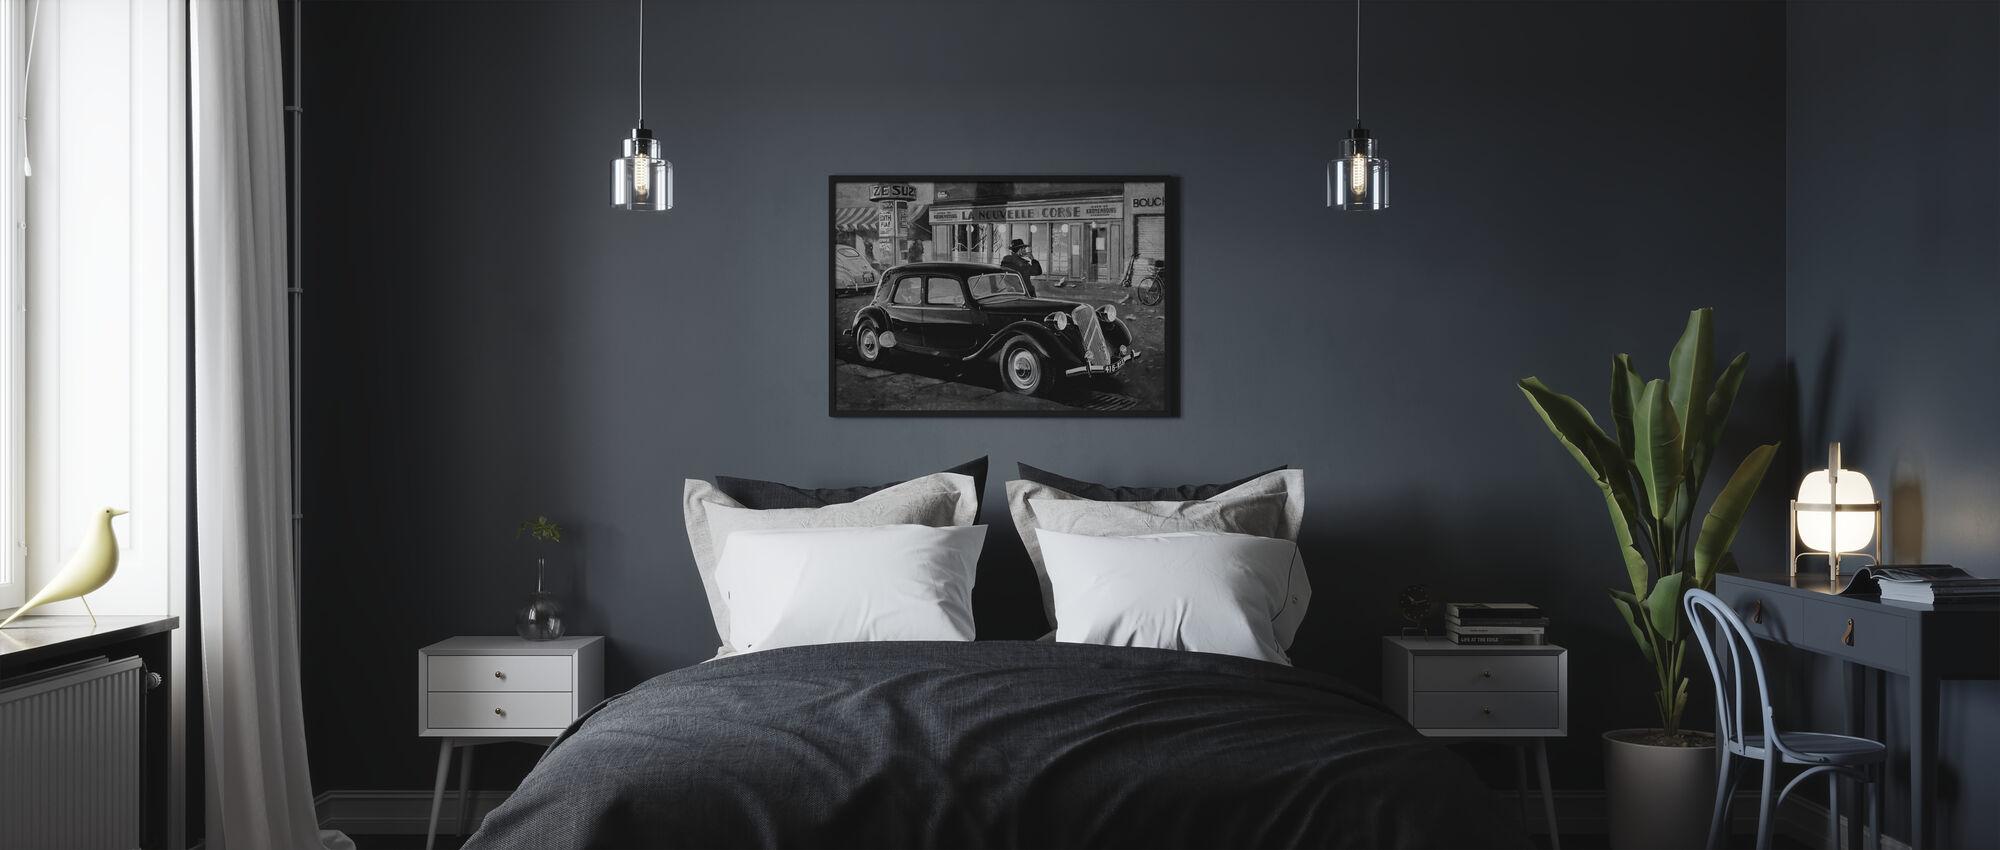 B15 in Paris BW - Poster - Bedroom